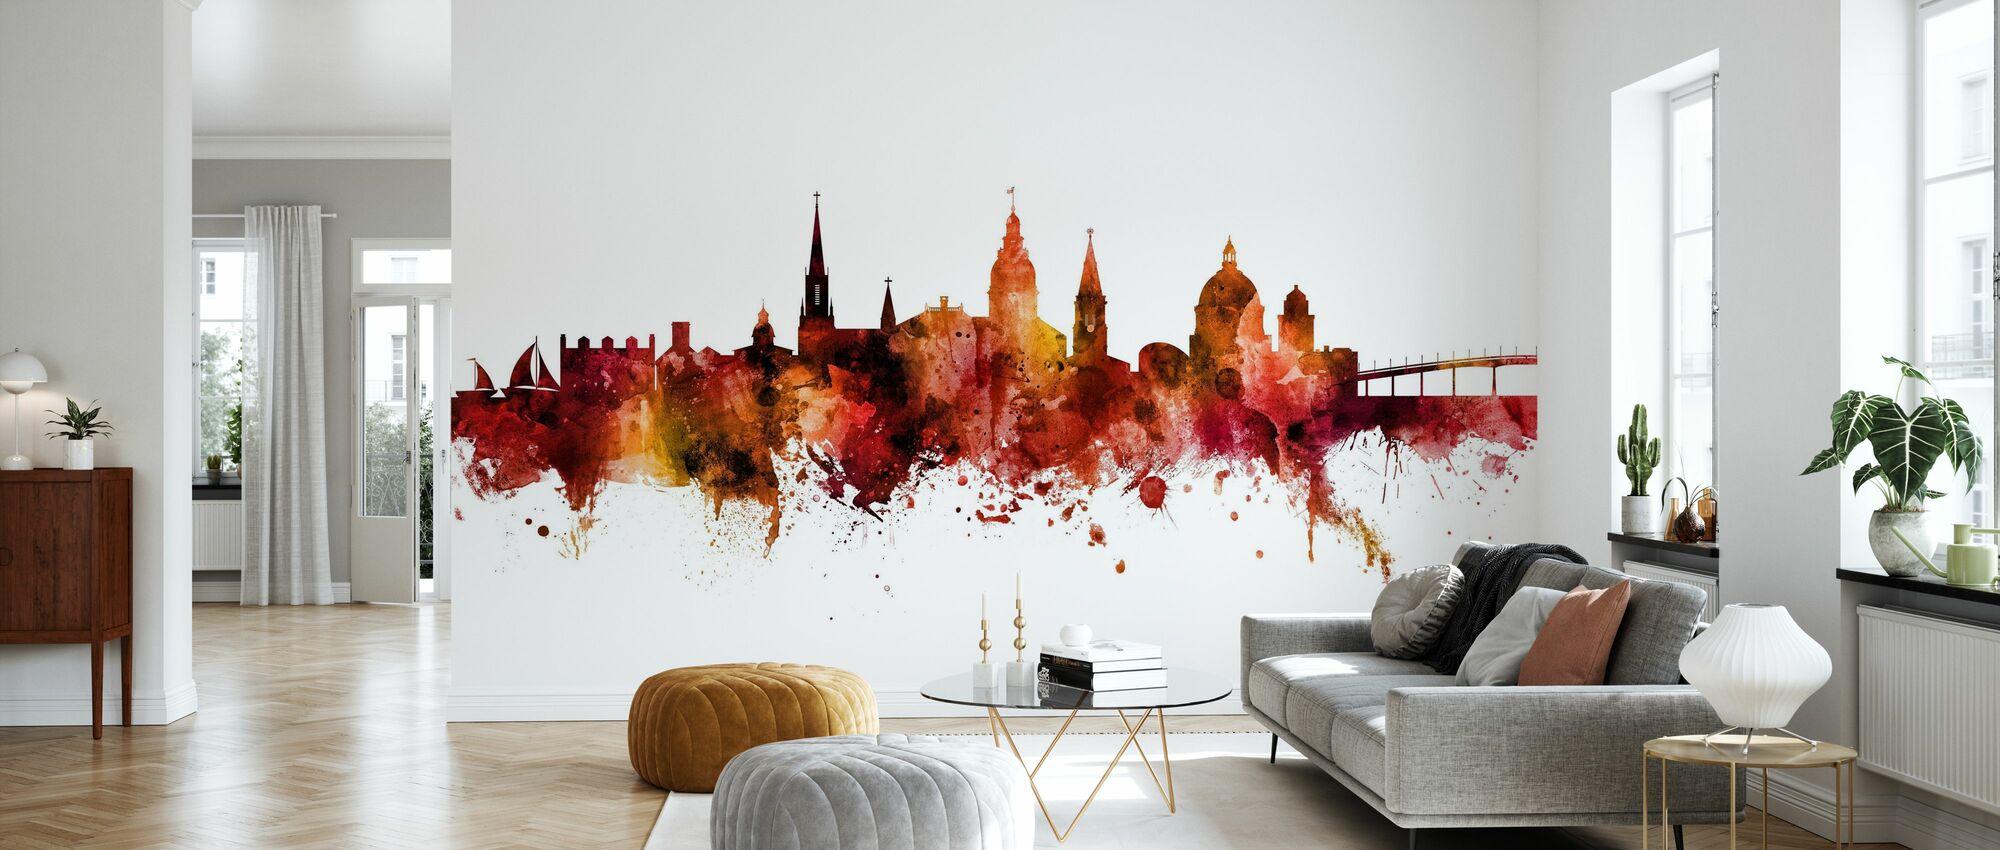 Annapolis Maryland Skyline - Wallpaper - Living Room